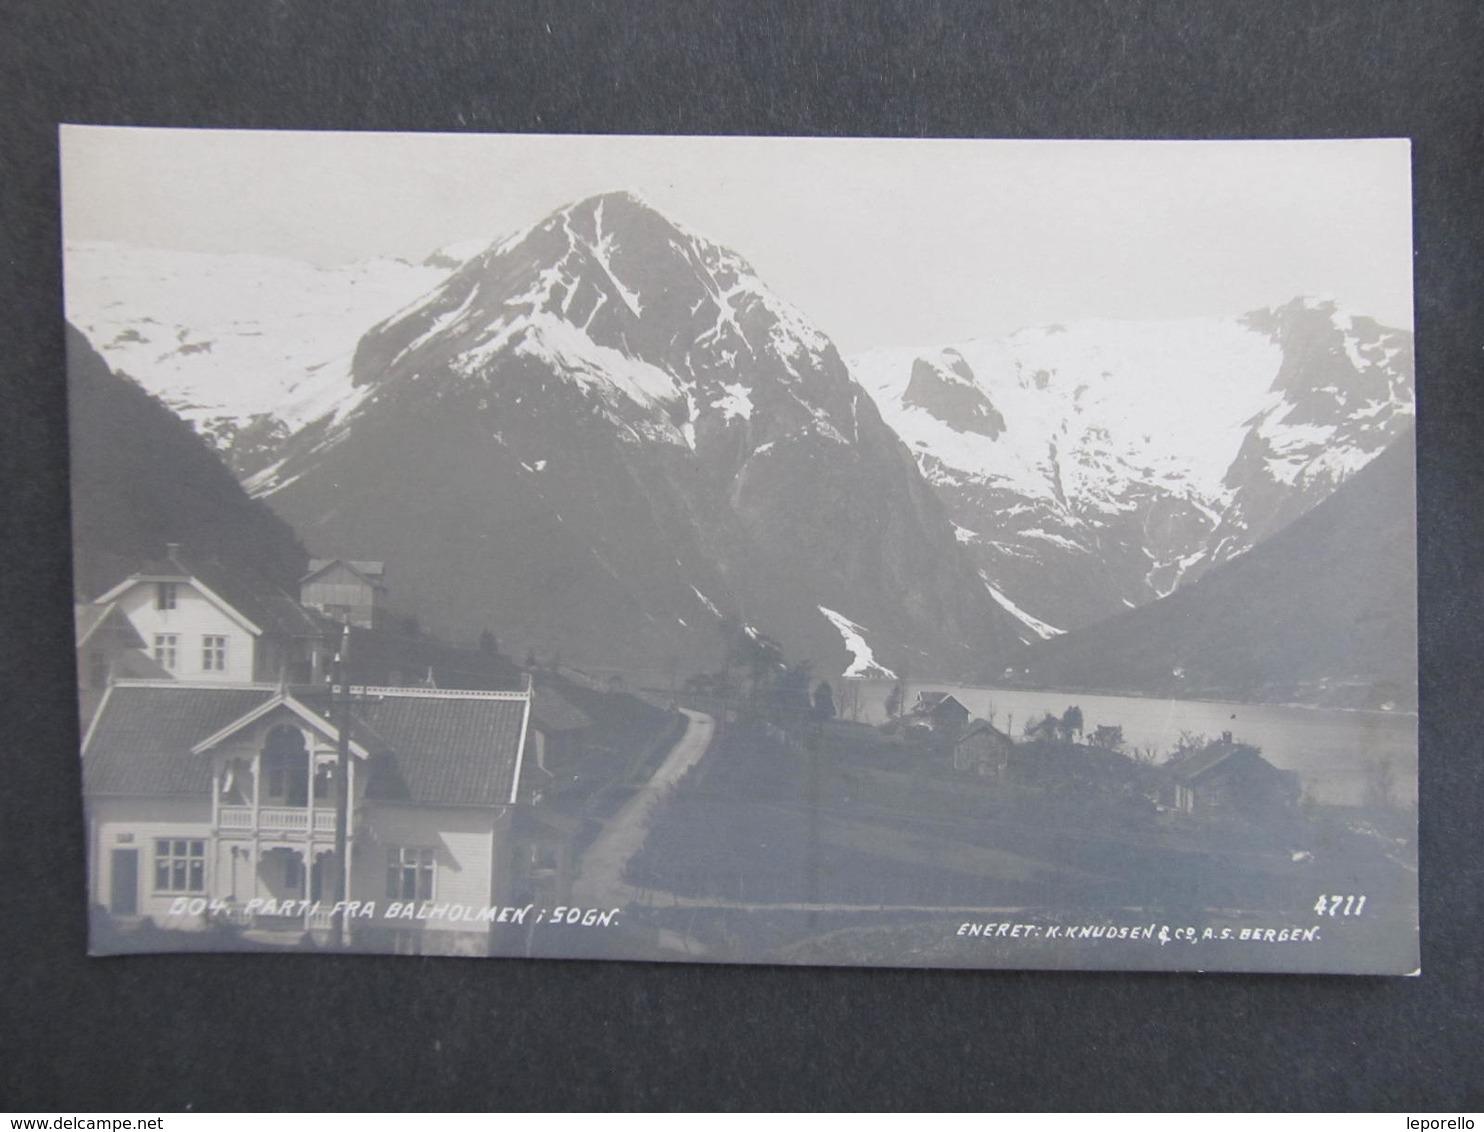 AK BALHOLMEN I Sogn  Ca.1910  ///  D*35360 - Norwegen